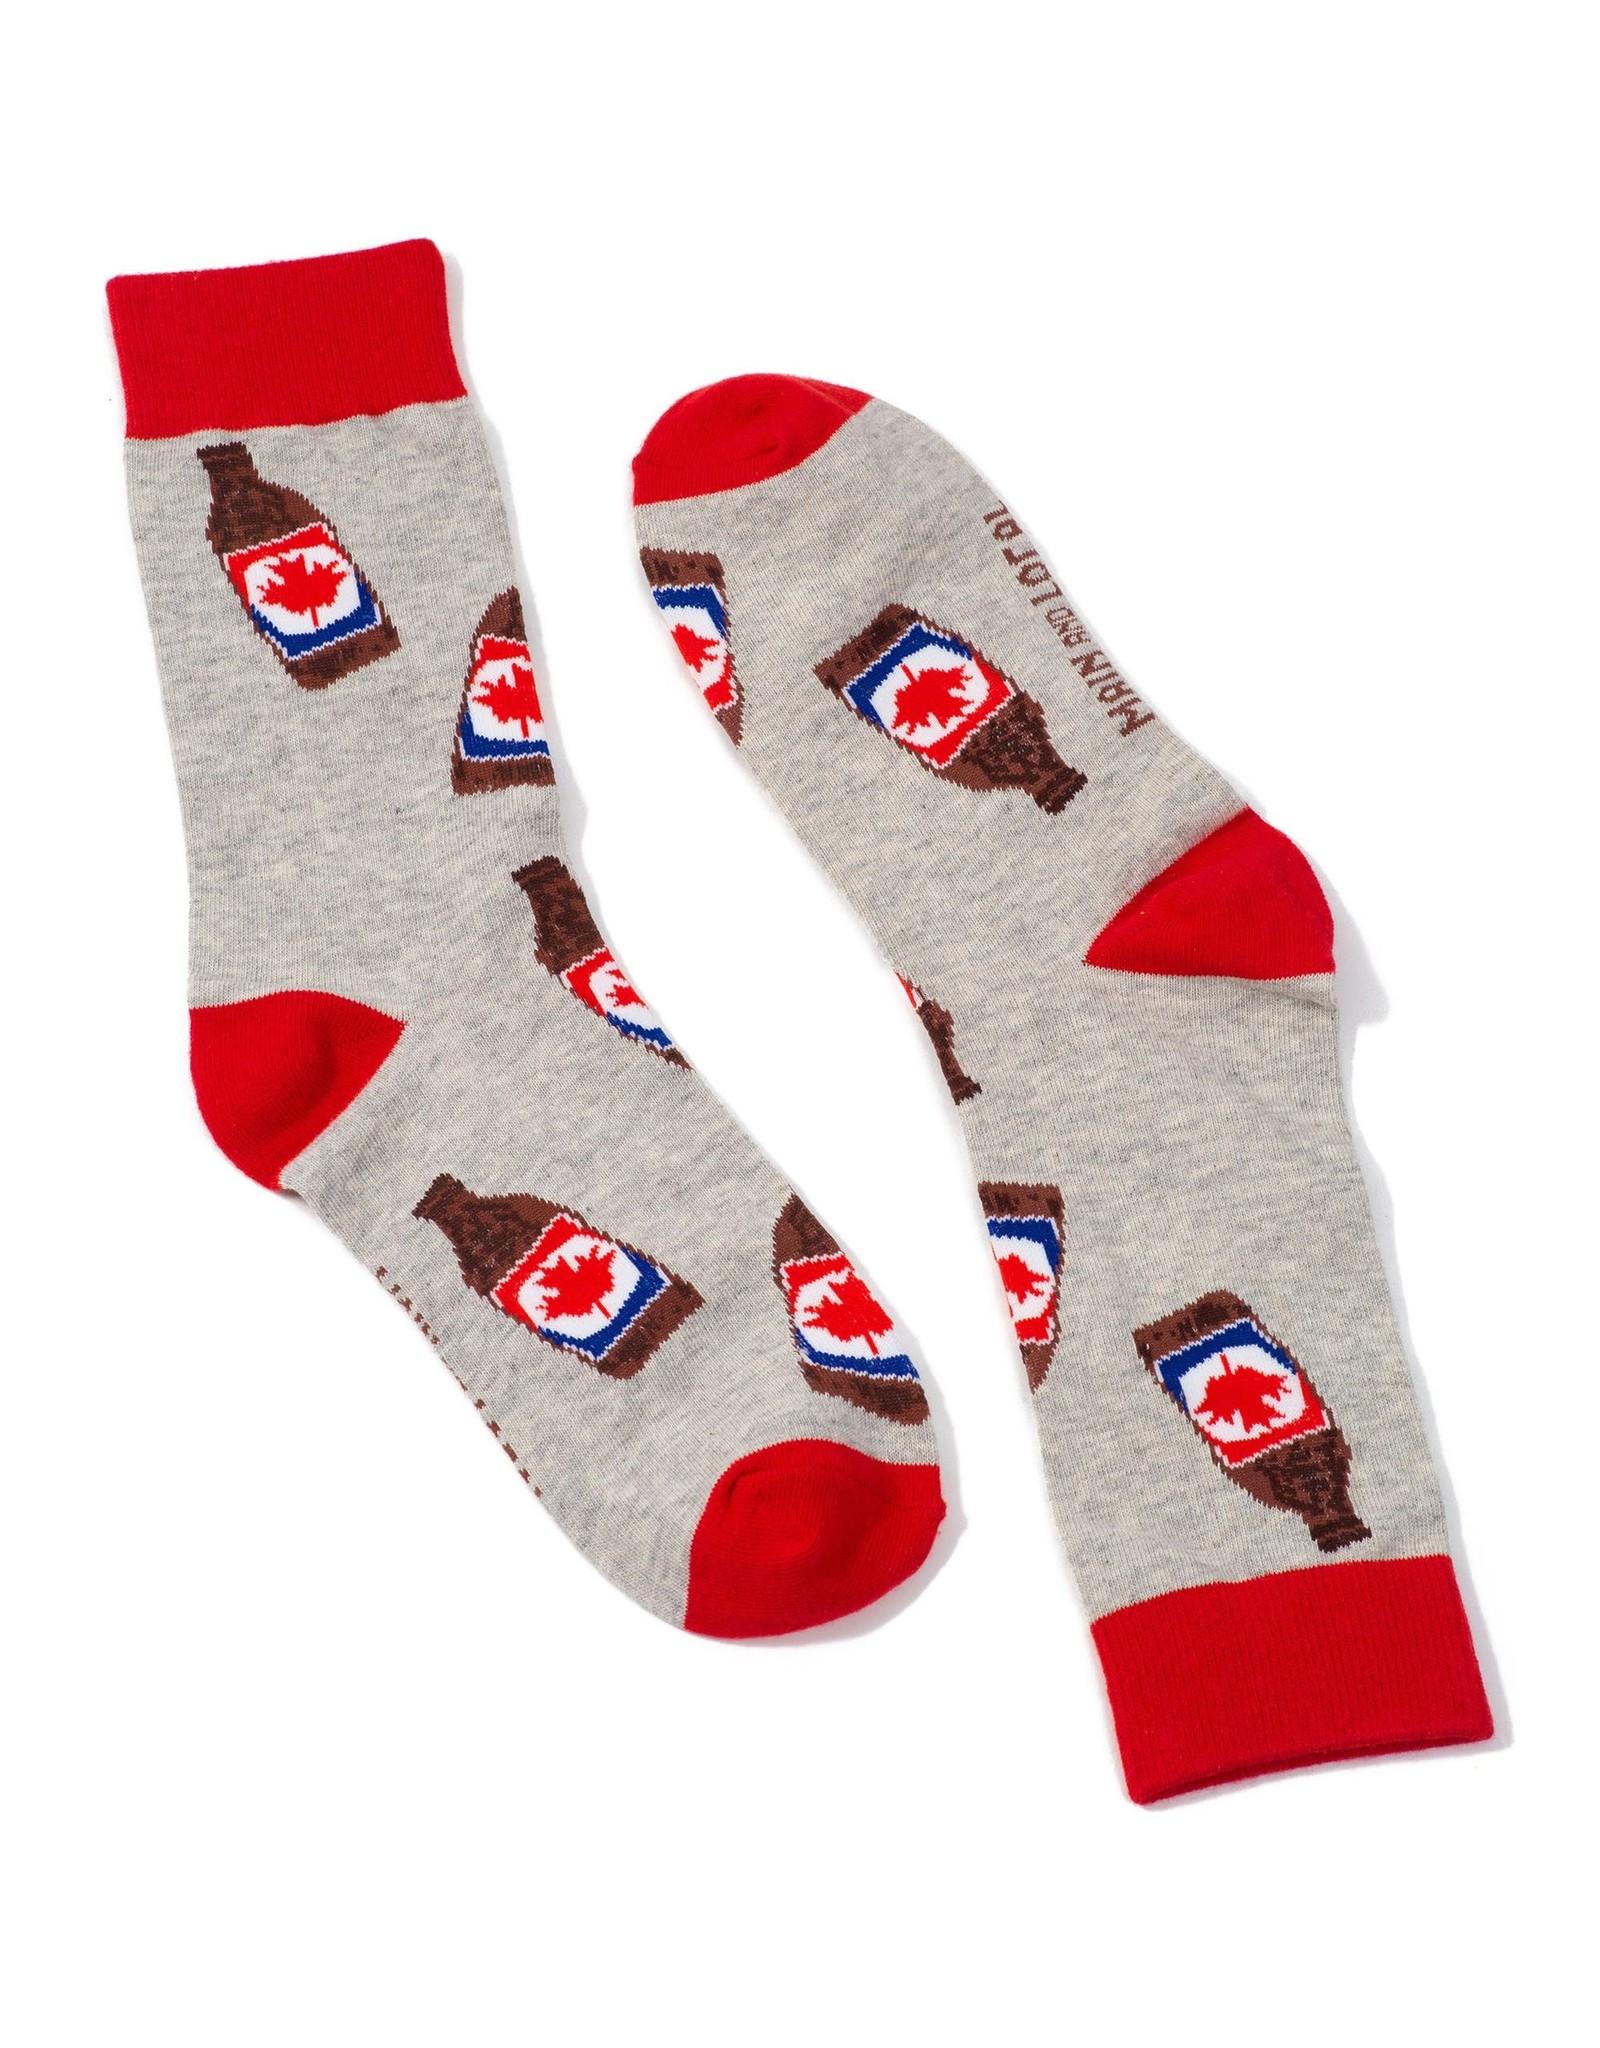 Main & Local Canada Beer Socks